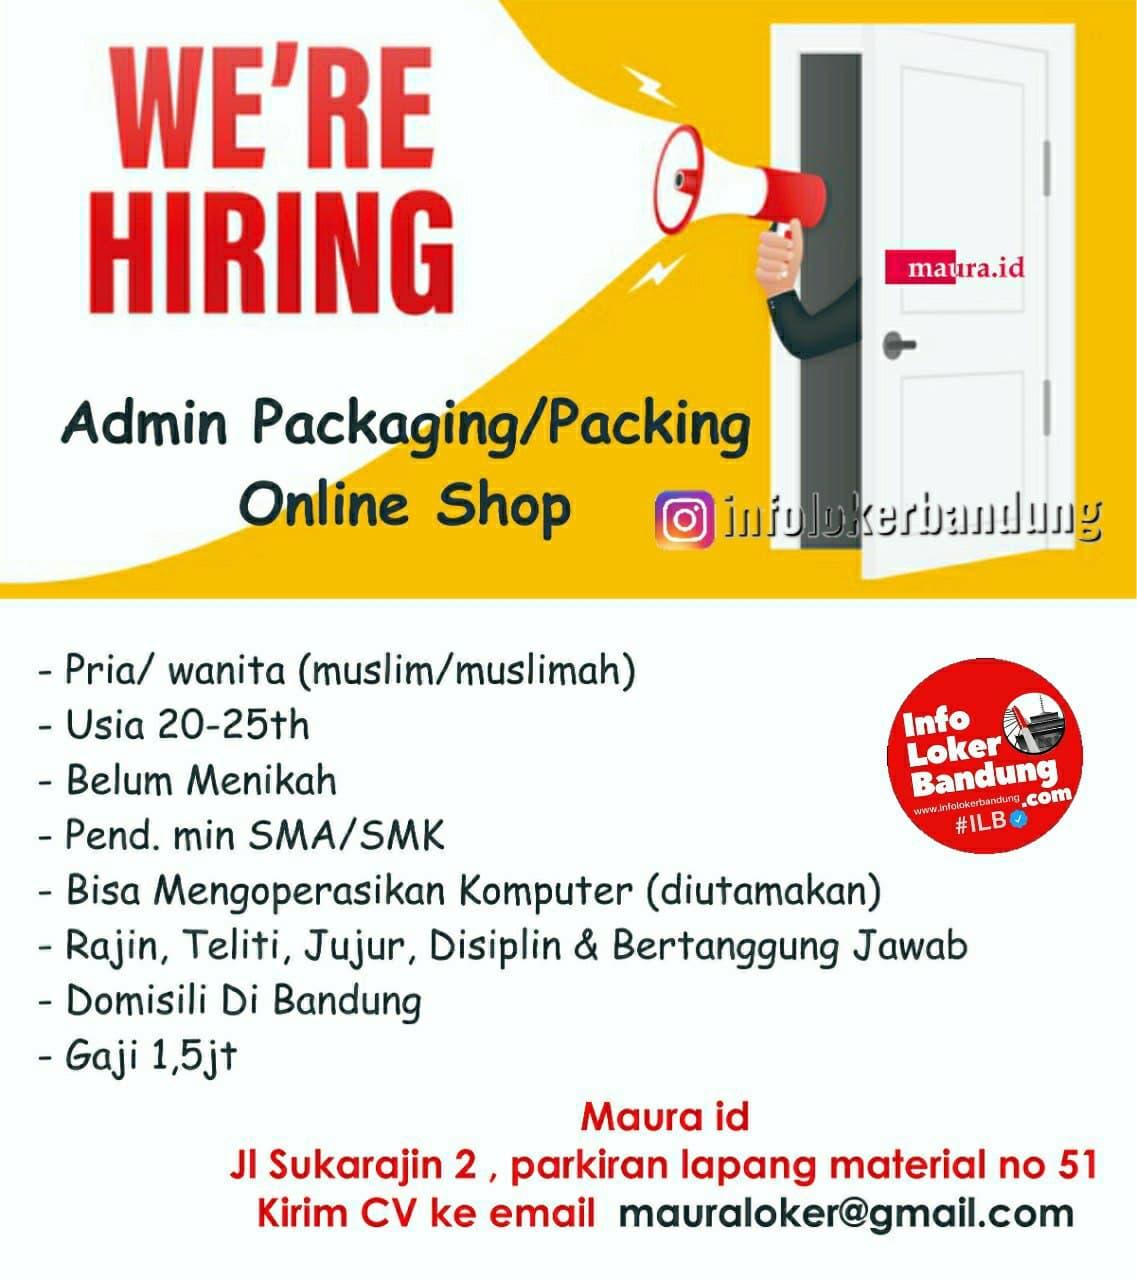 Lowongan Kerja Admin Packaging / Packing Online Shop Maura Id Bandung Januari 2021